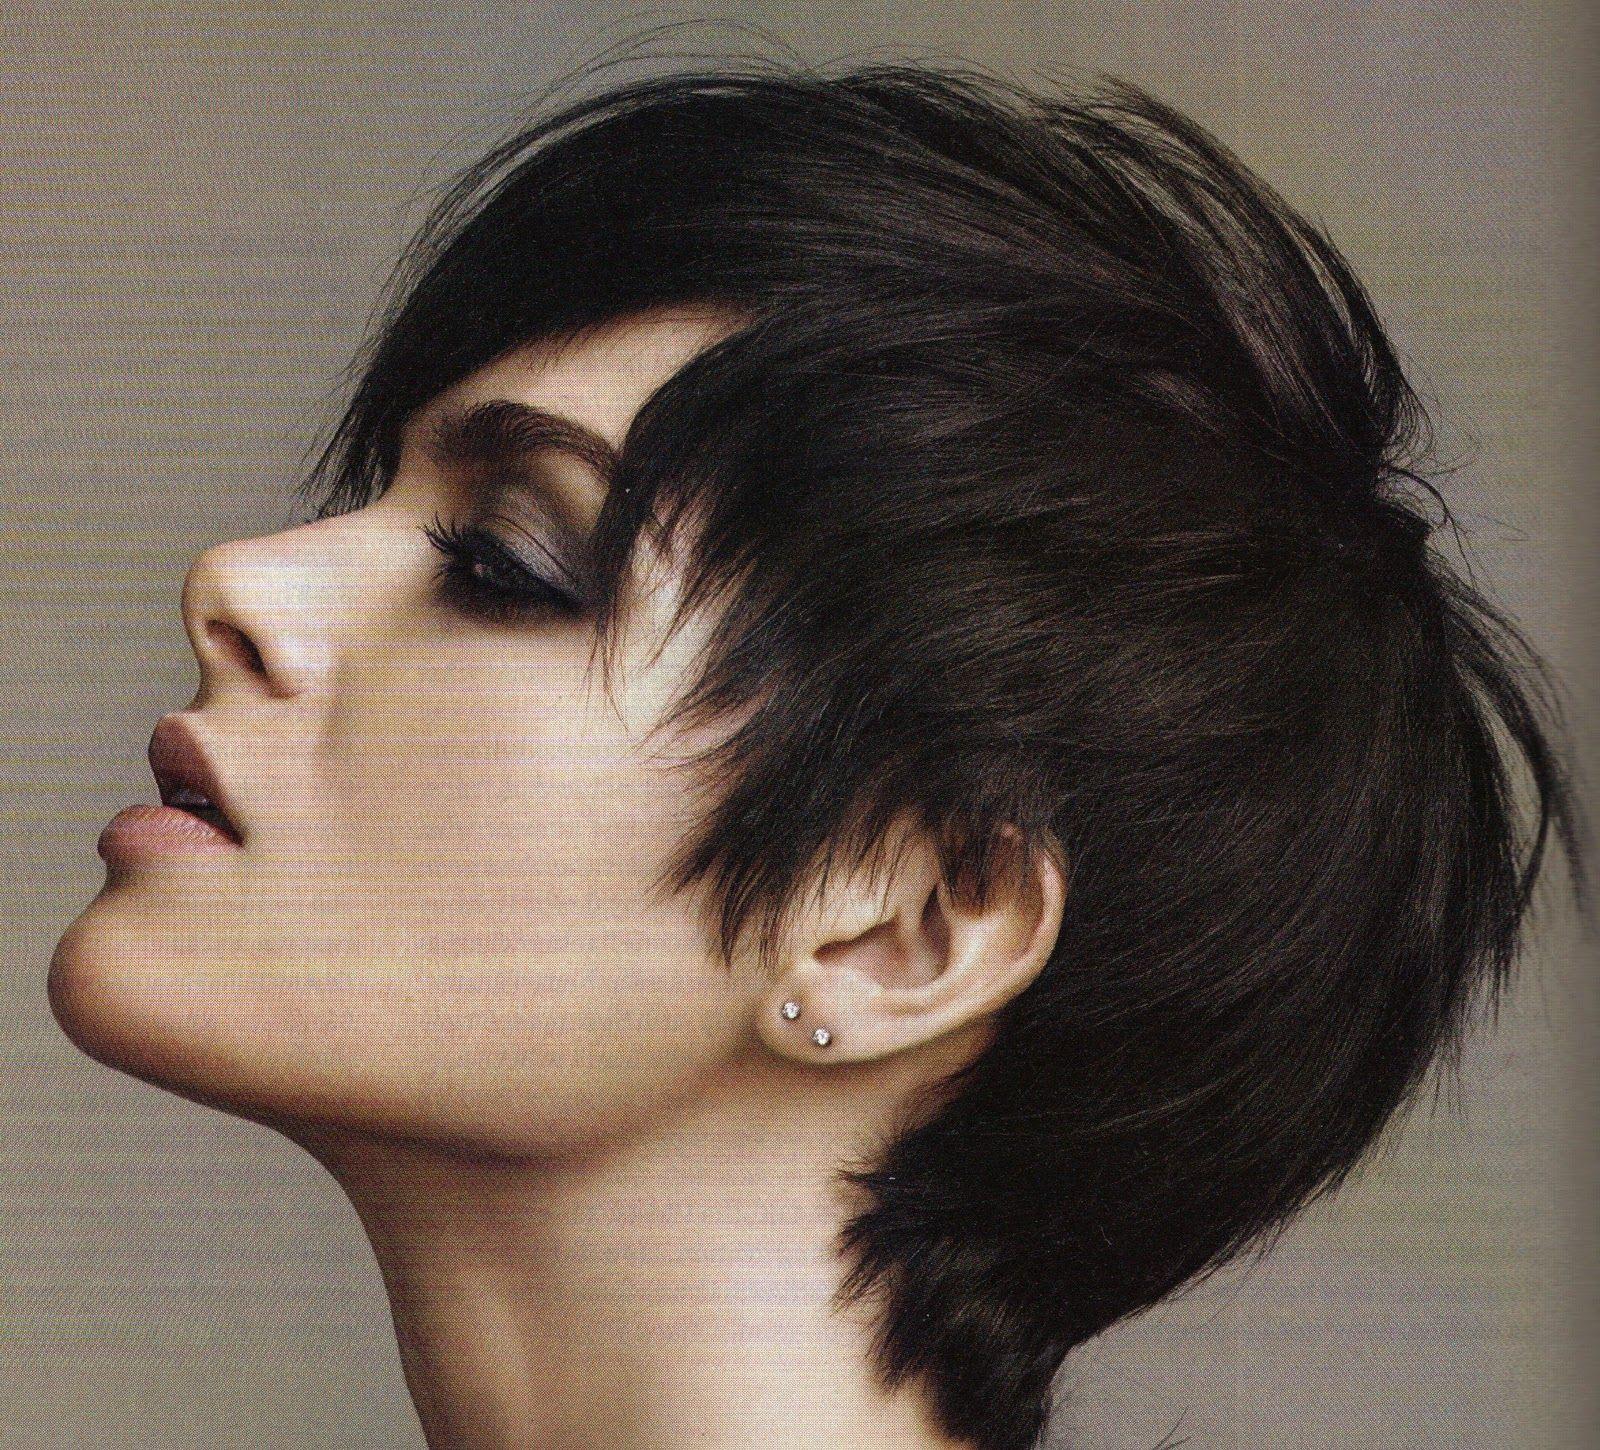 Short pixie crop hairstyles hair colors ideas best hair